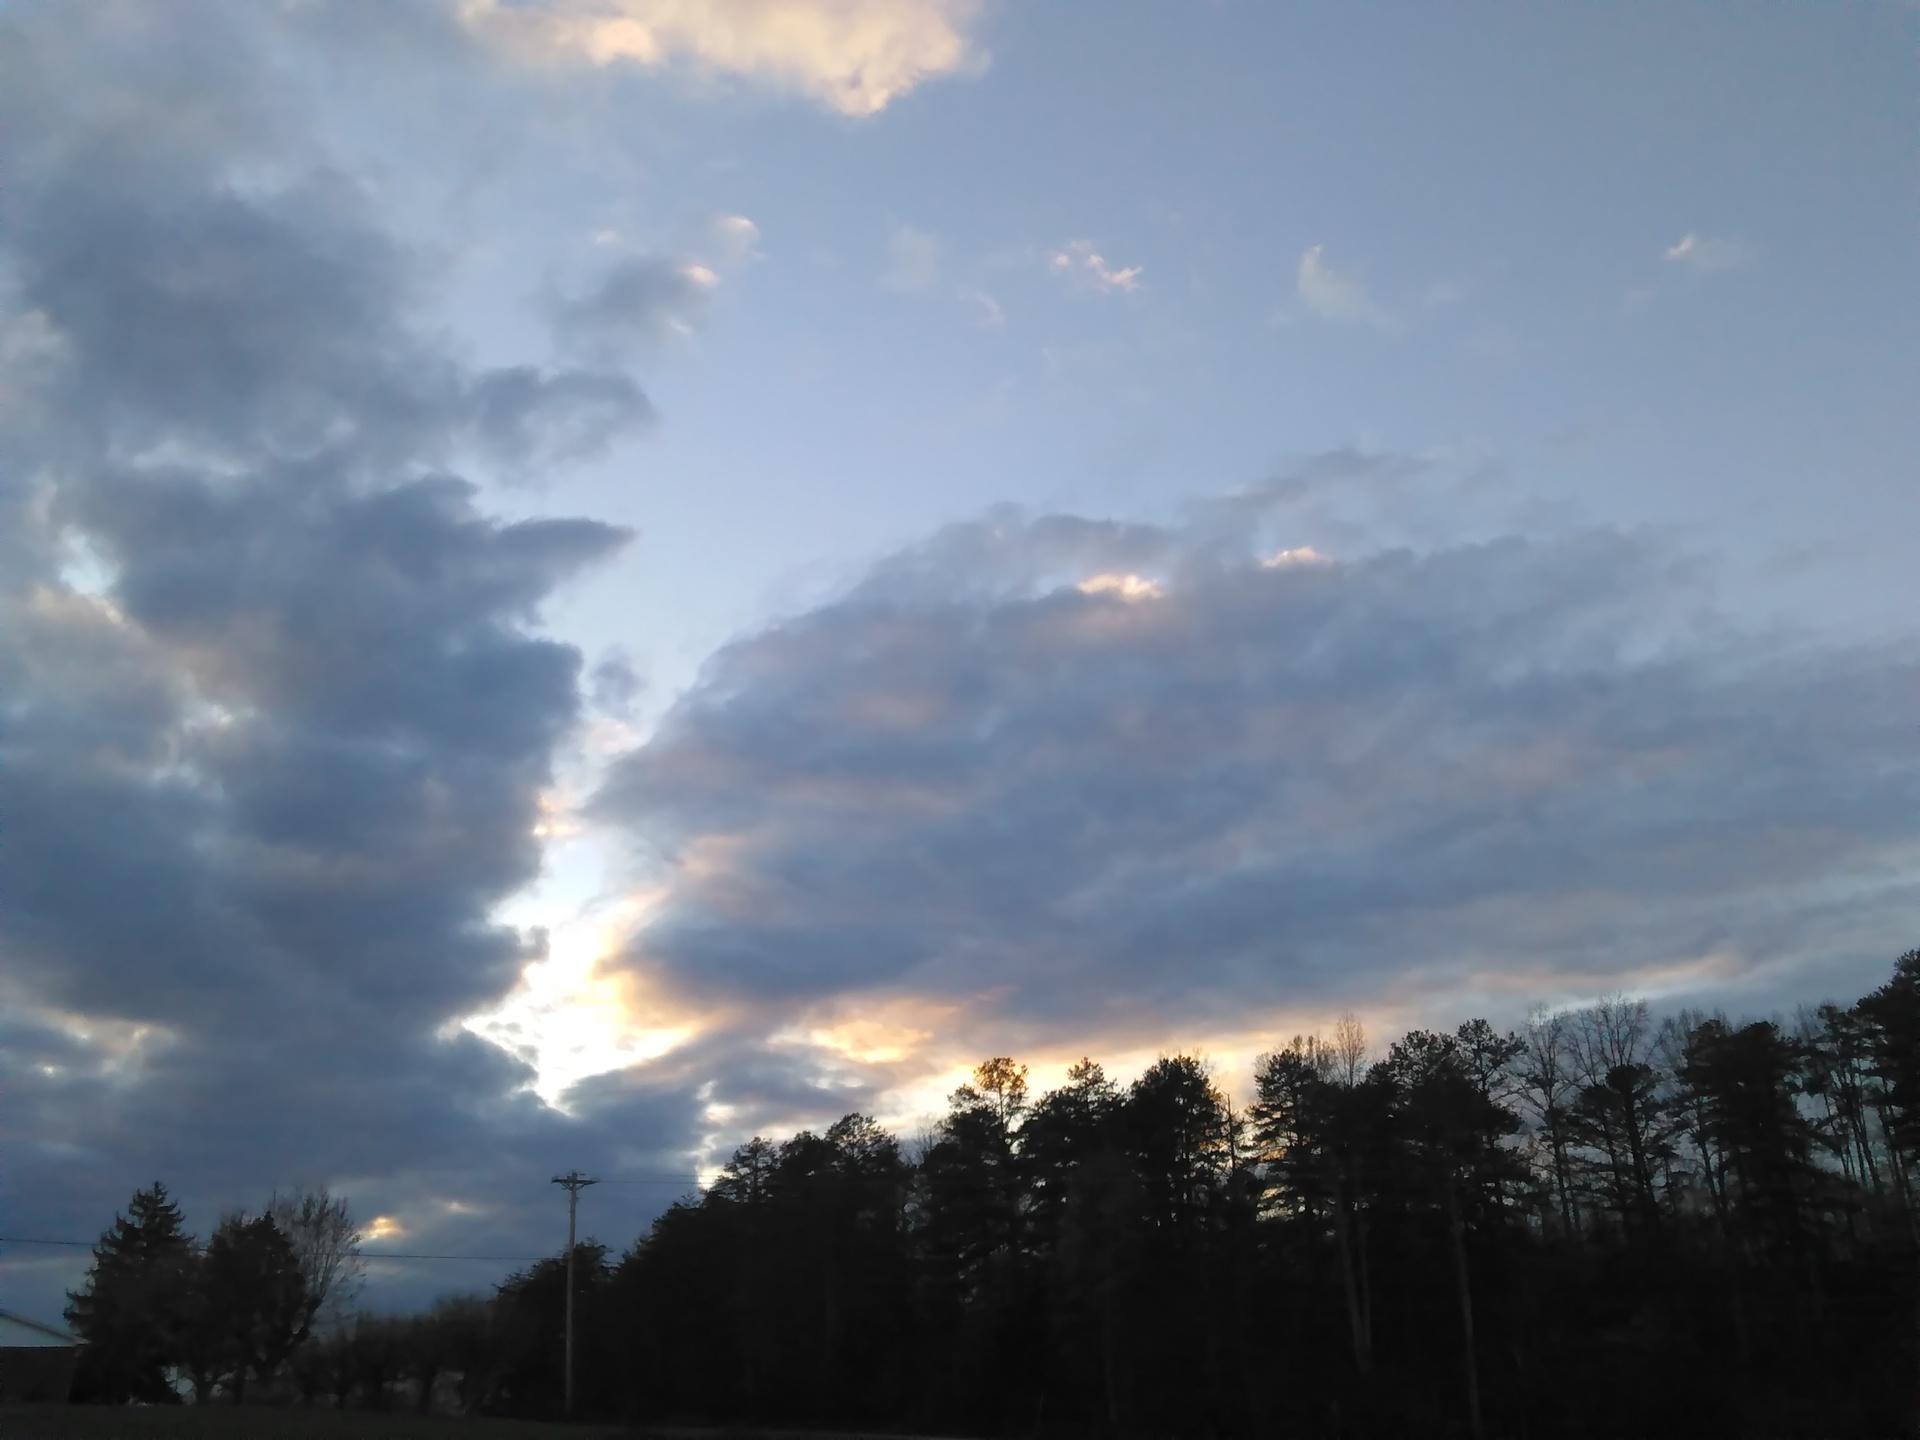 The evening break   codenamesailorearth, cloud, landscape, light